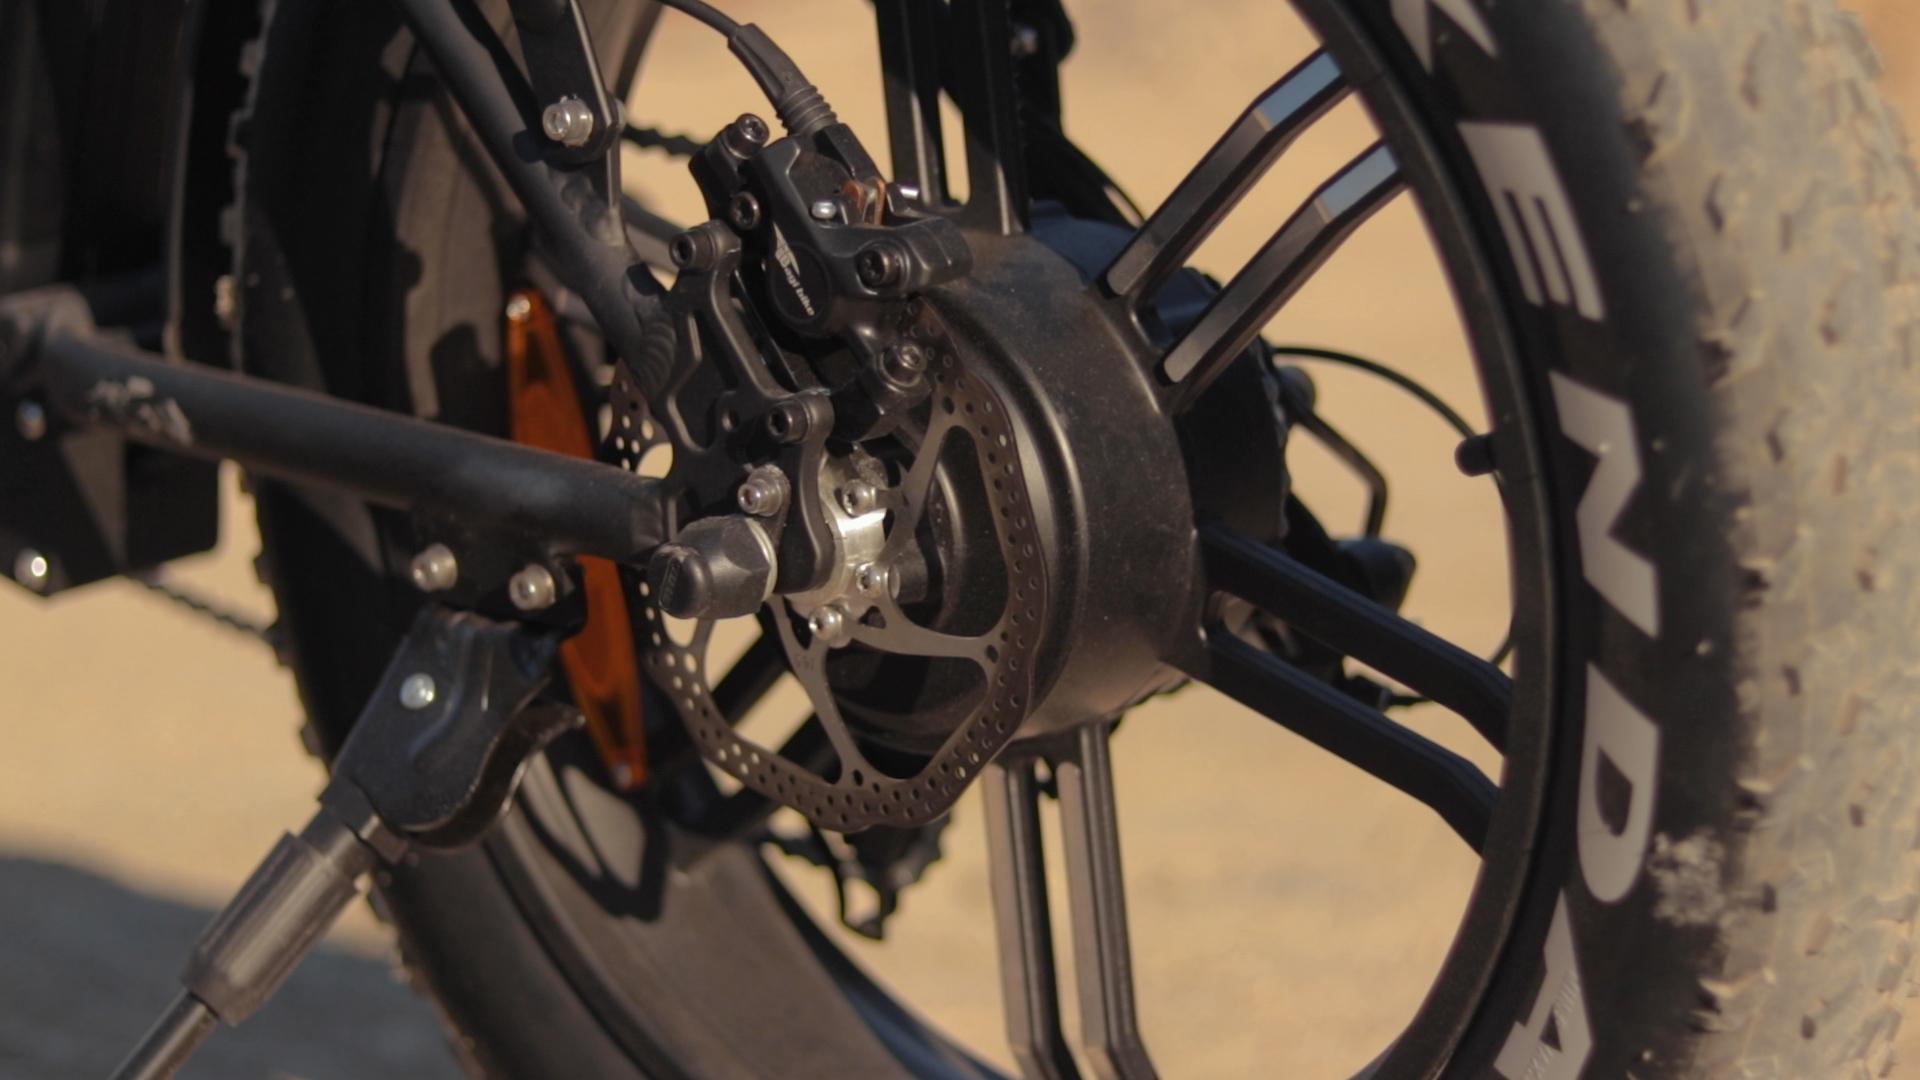 electrified-reviews-bagibike-b20-premium-electric-bike-review-bafang-500-watt-motor.jpg